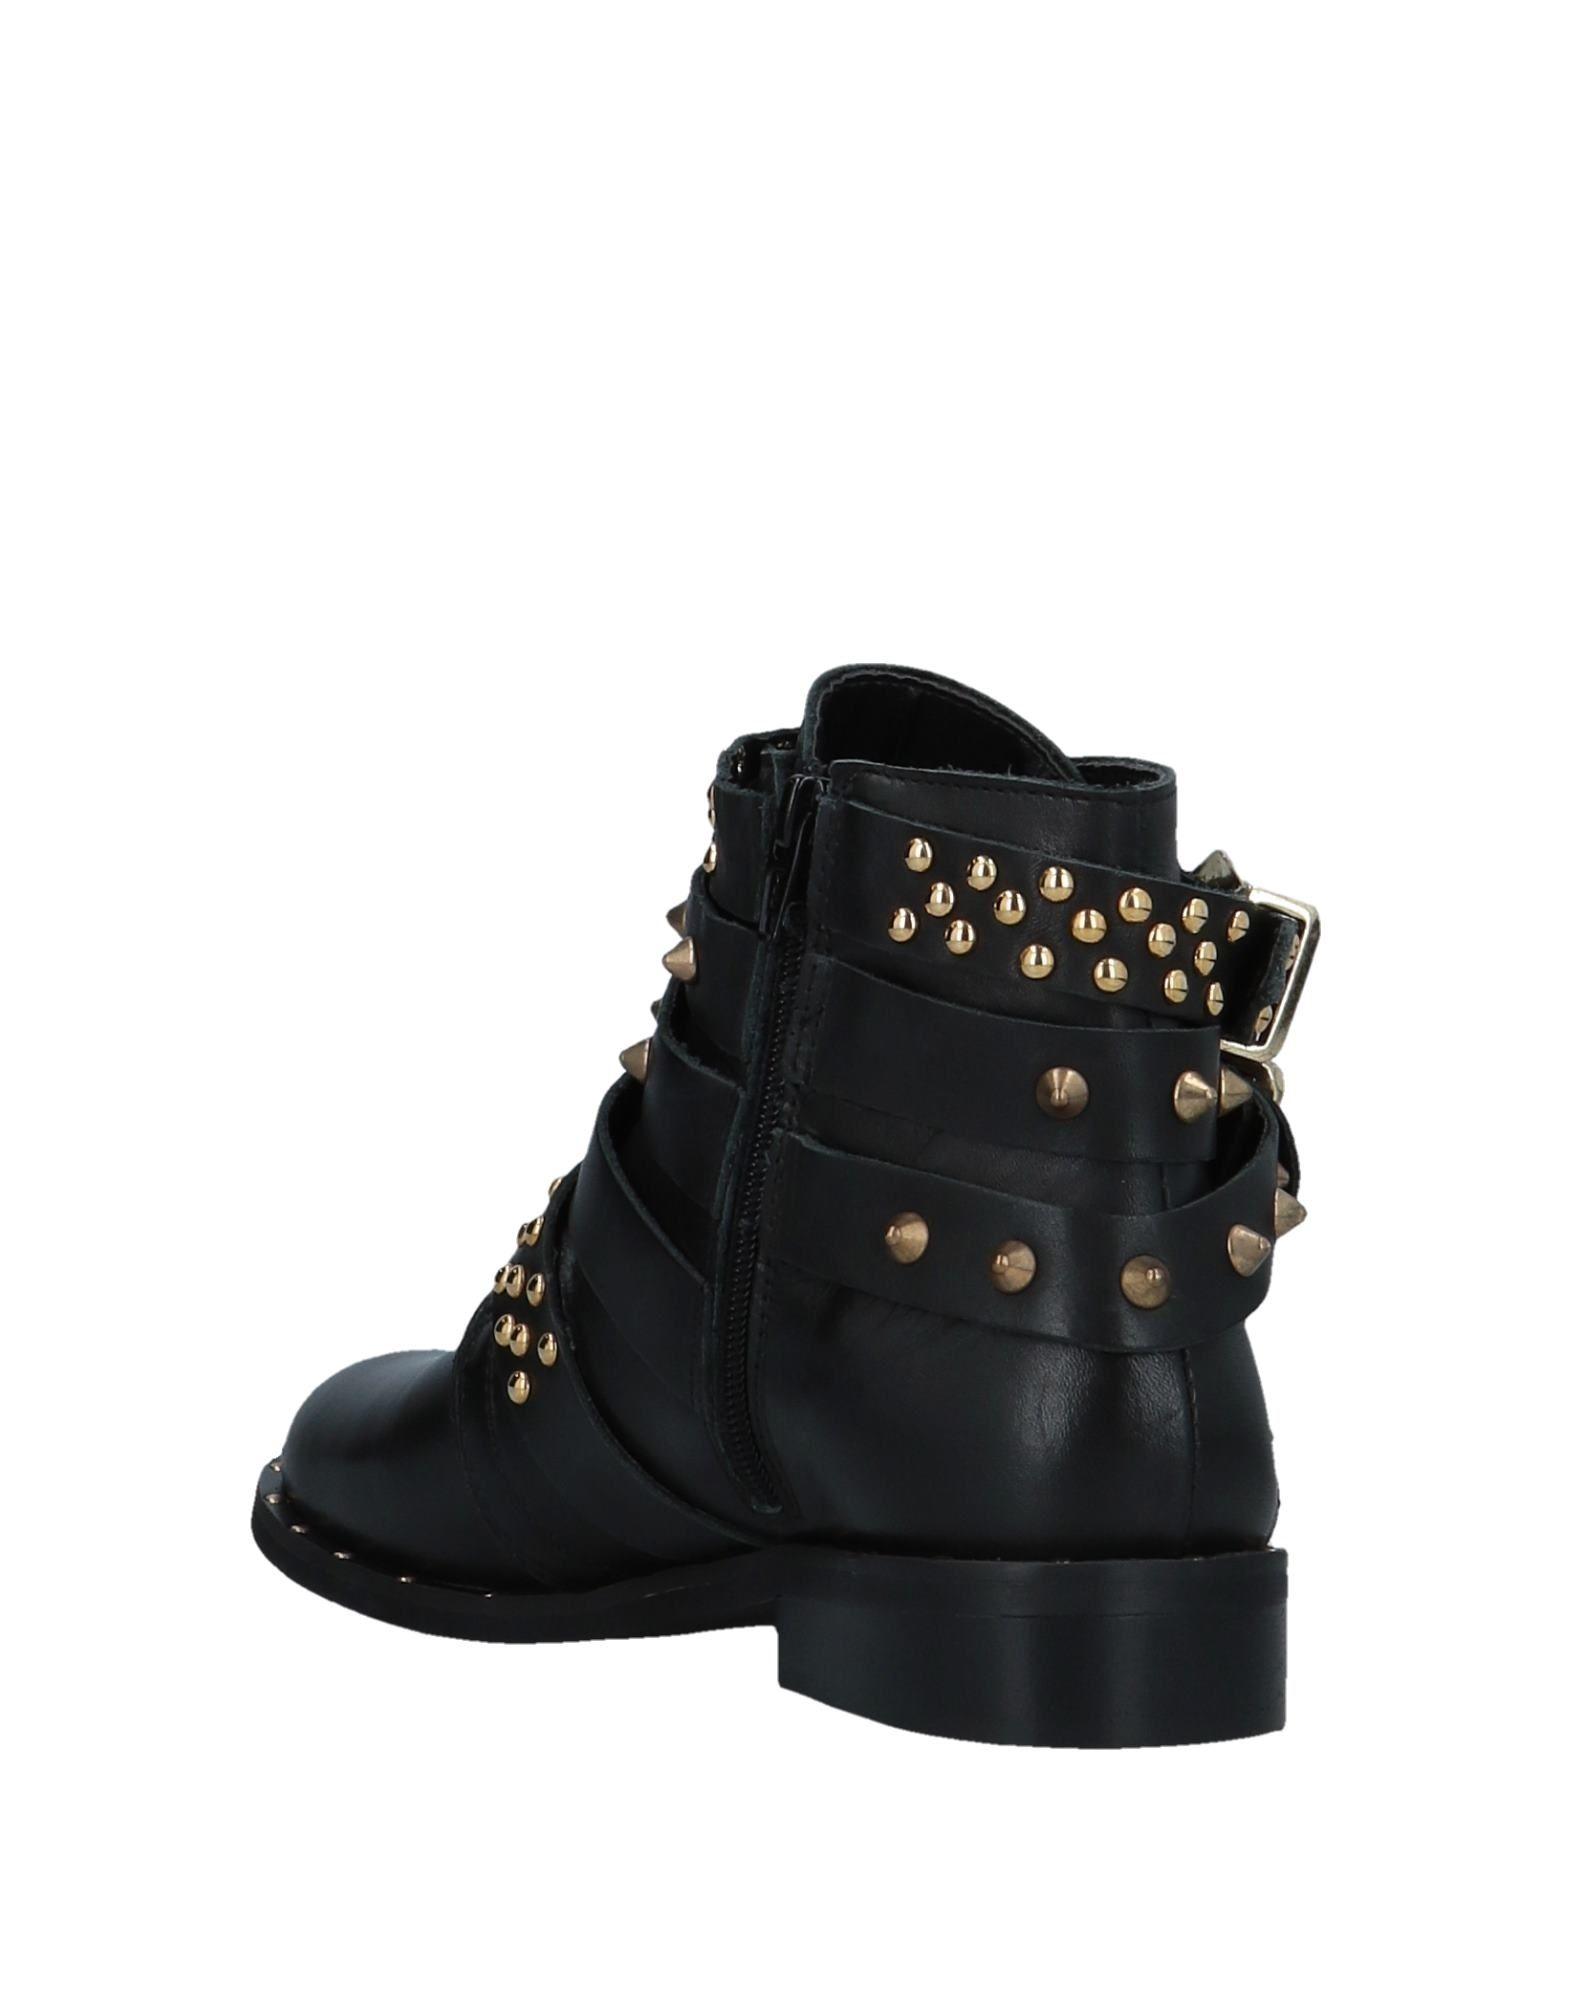 Stilvolle billige  Schuhe J.Born Stiefelette Damen  billige 11532879VD 595399